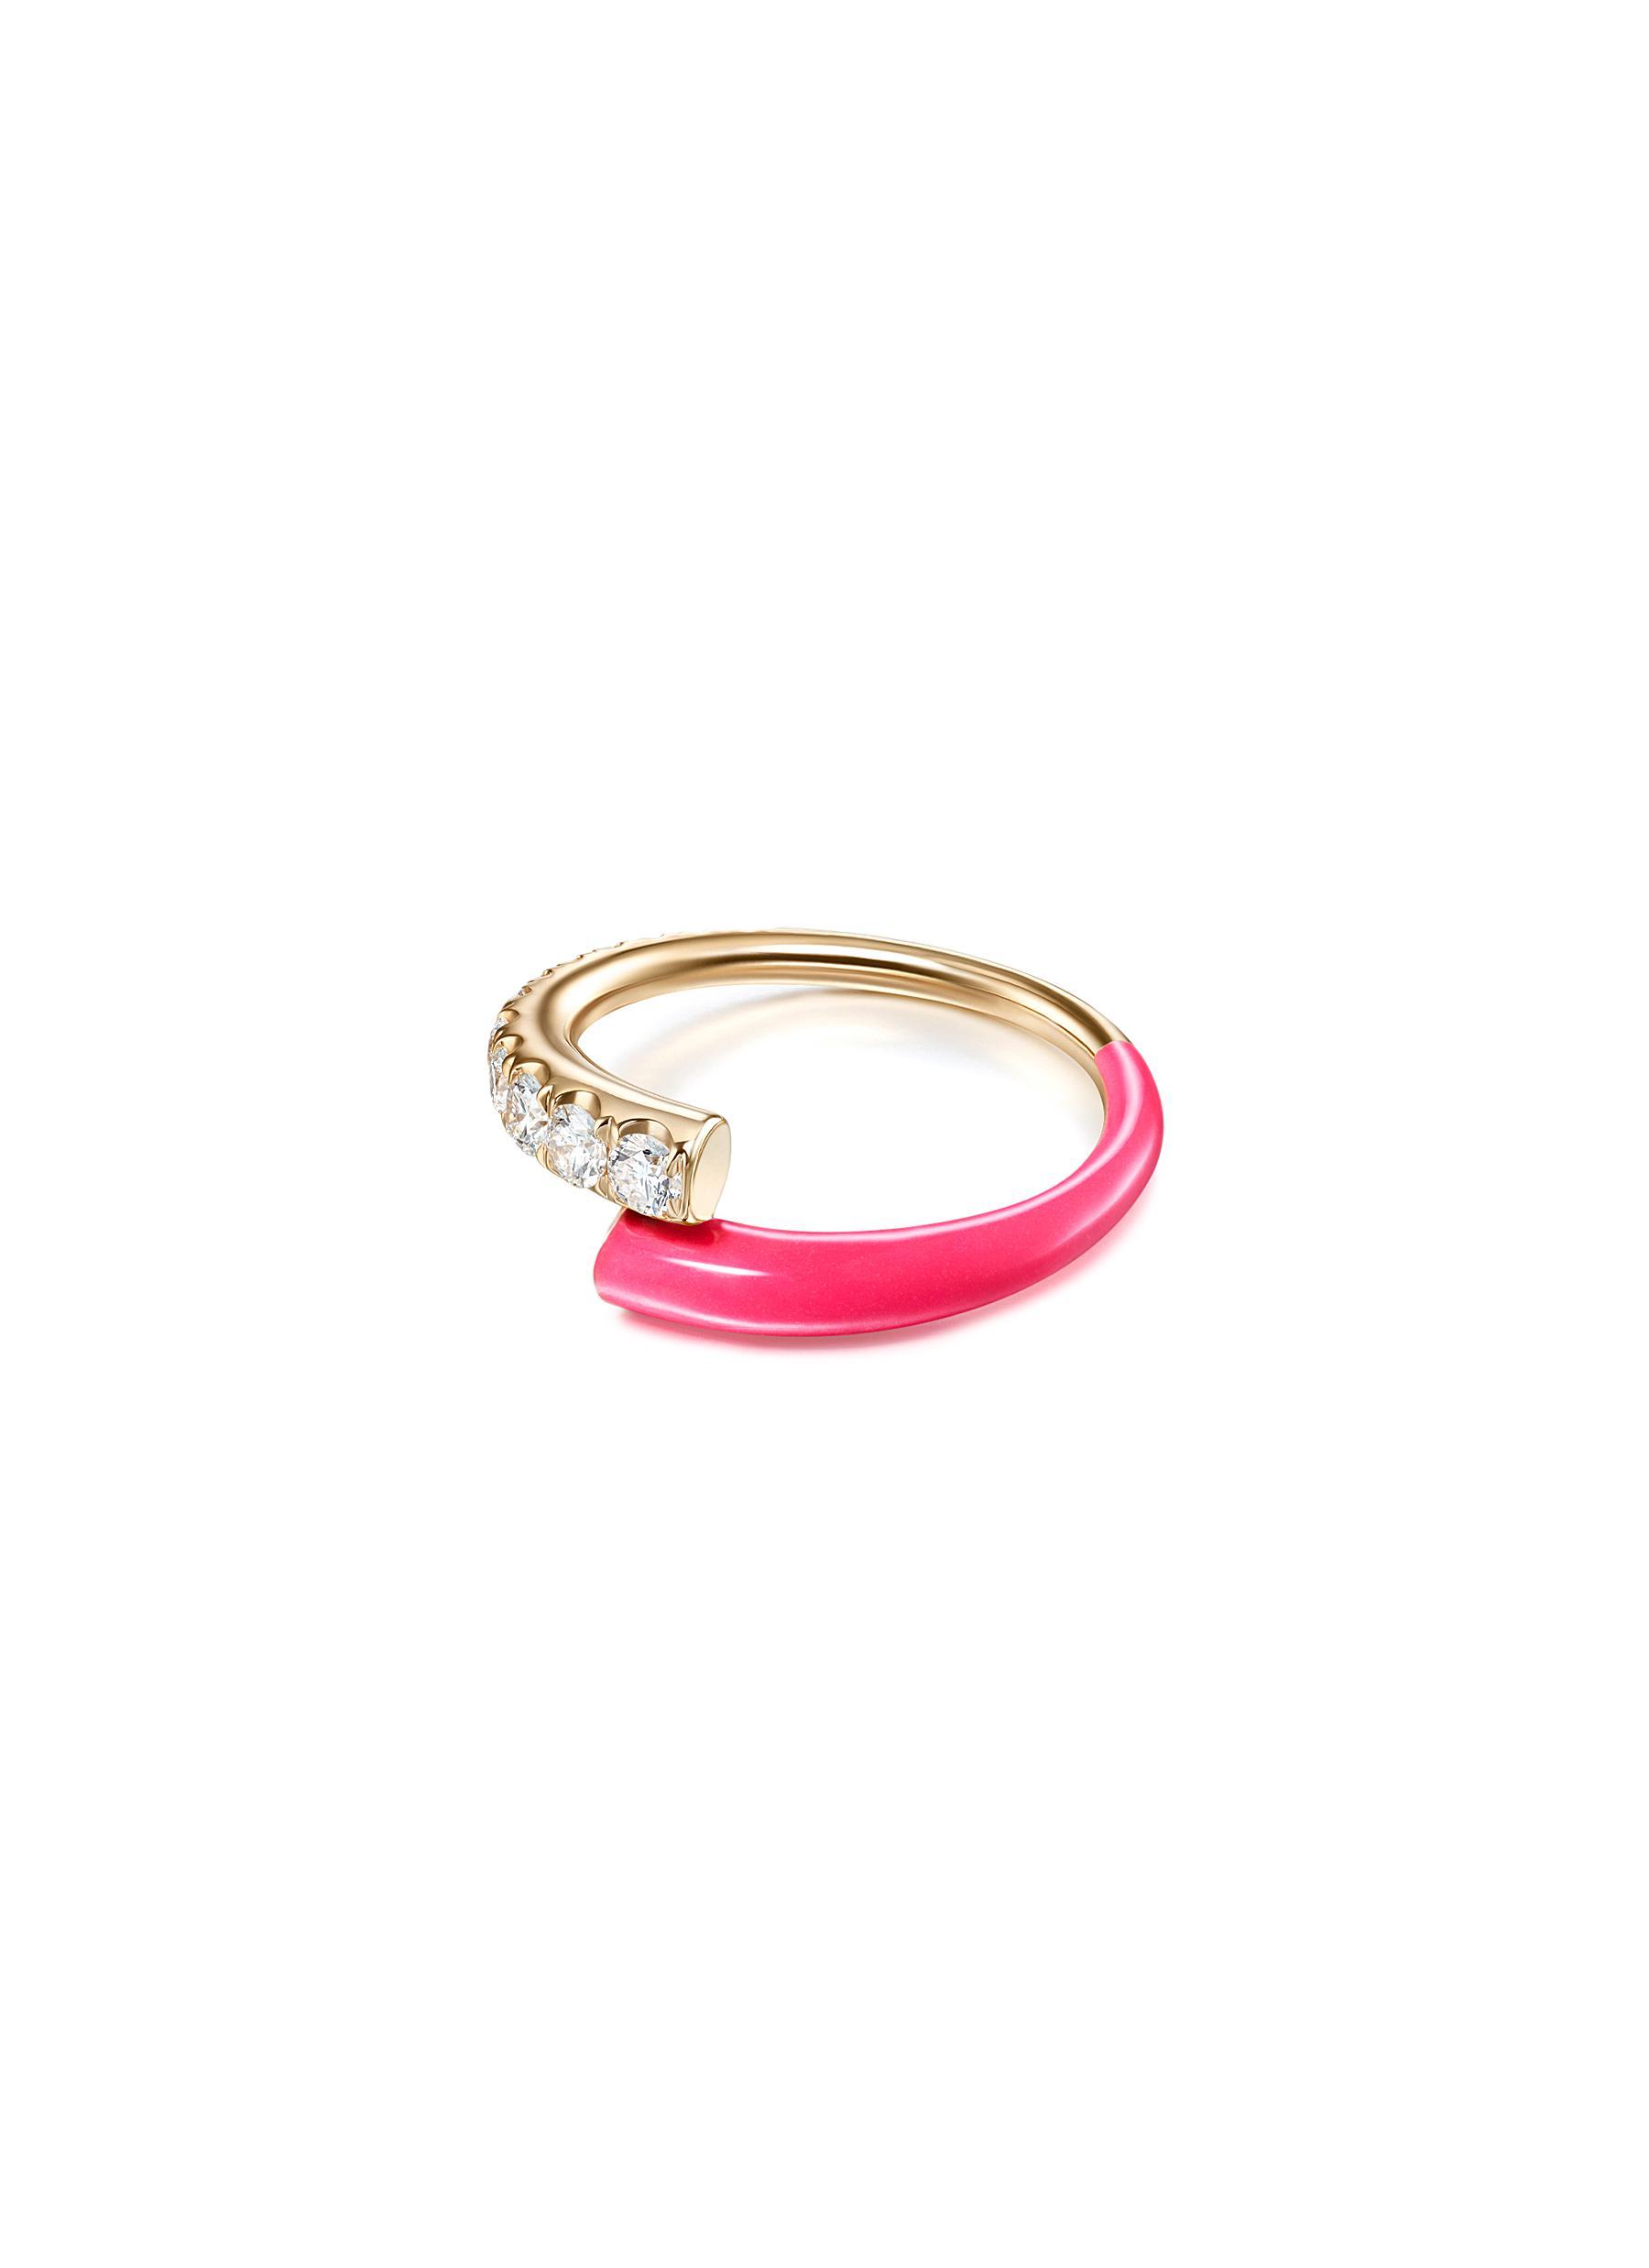 'Lola' Diamond 18k Rose Gold Enamel Accent Ring